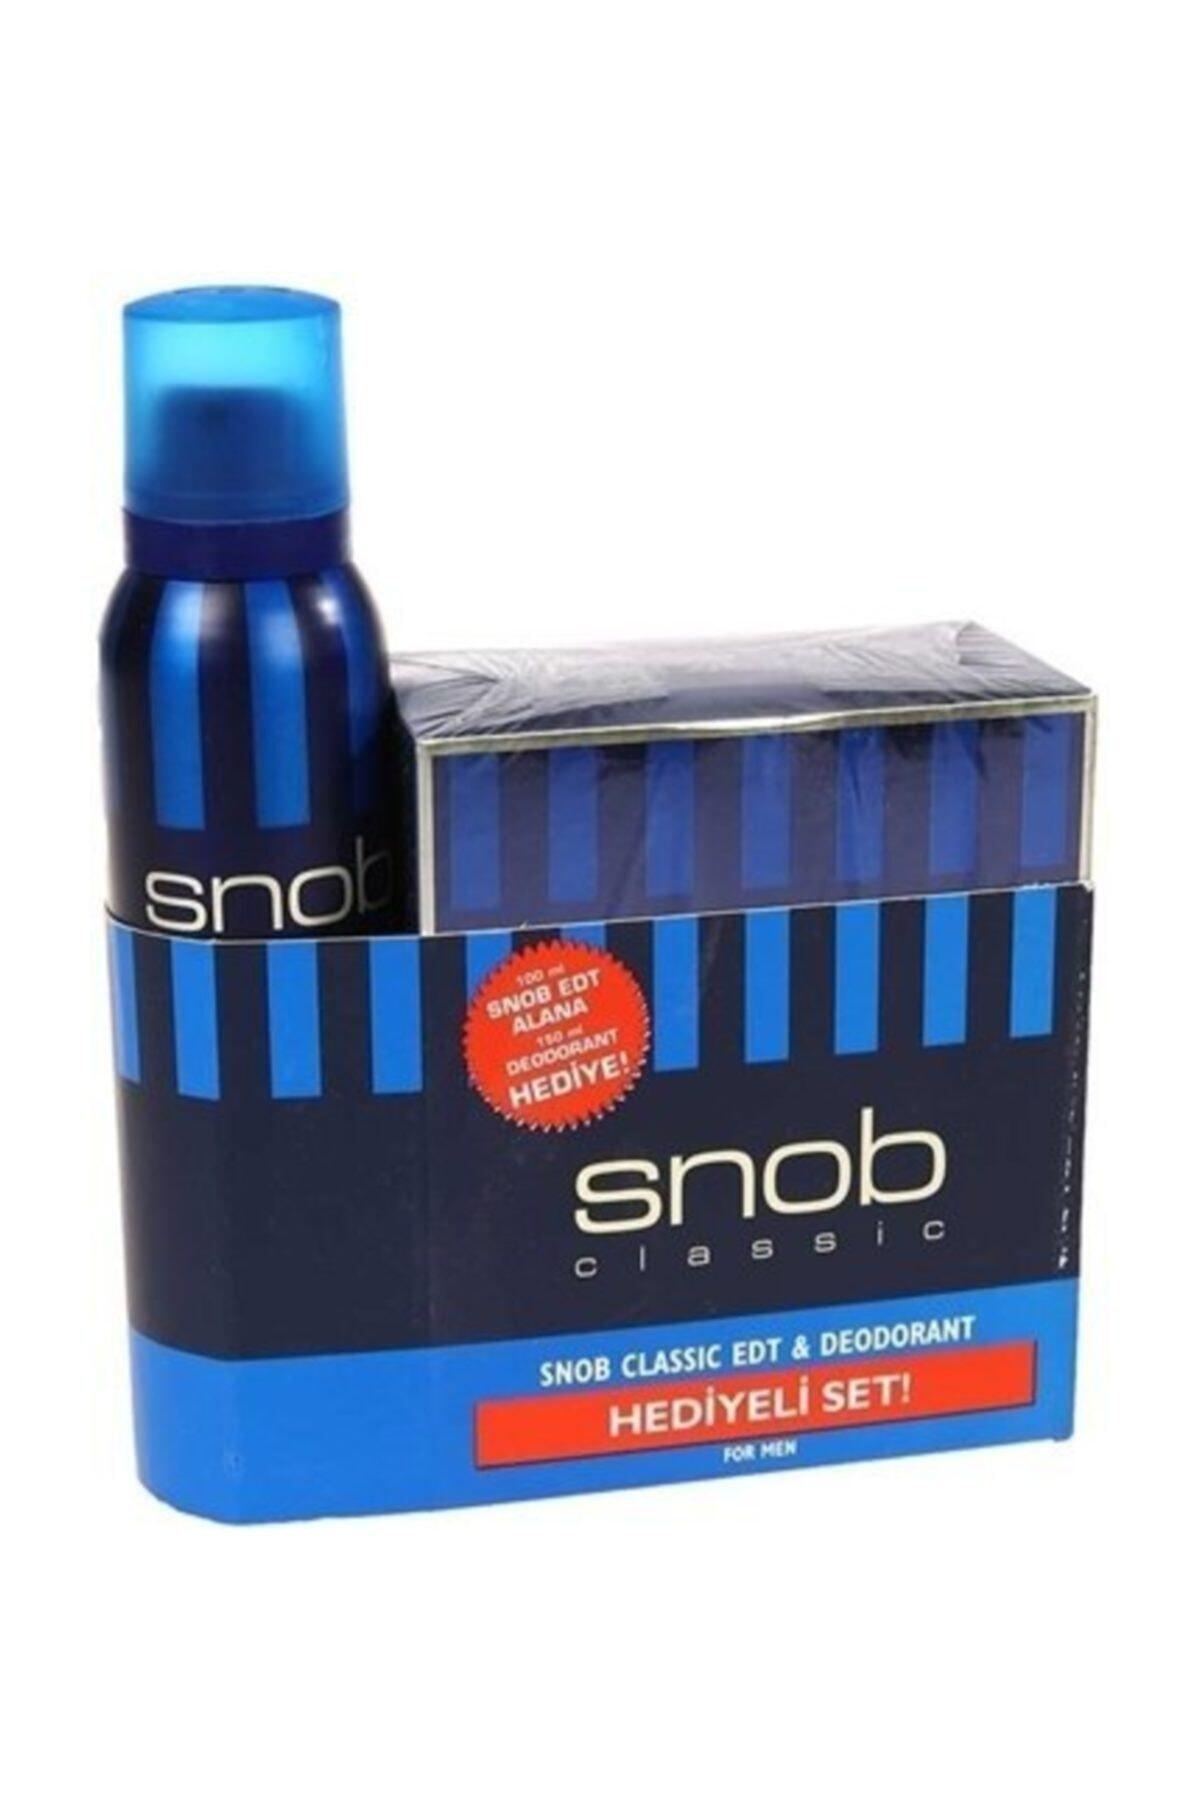 Snob Classıc Edt 100ml Deodorant 150ml  Erkek Parfüm Seti 8690644015717 1